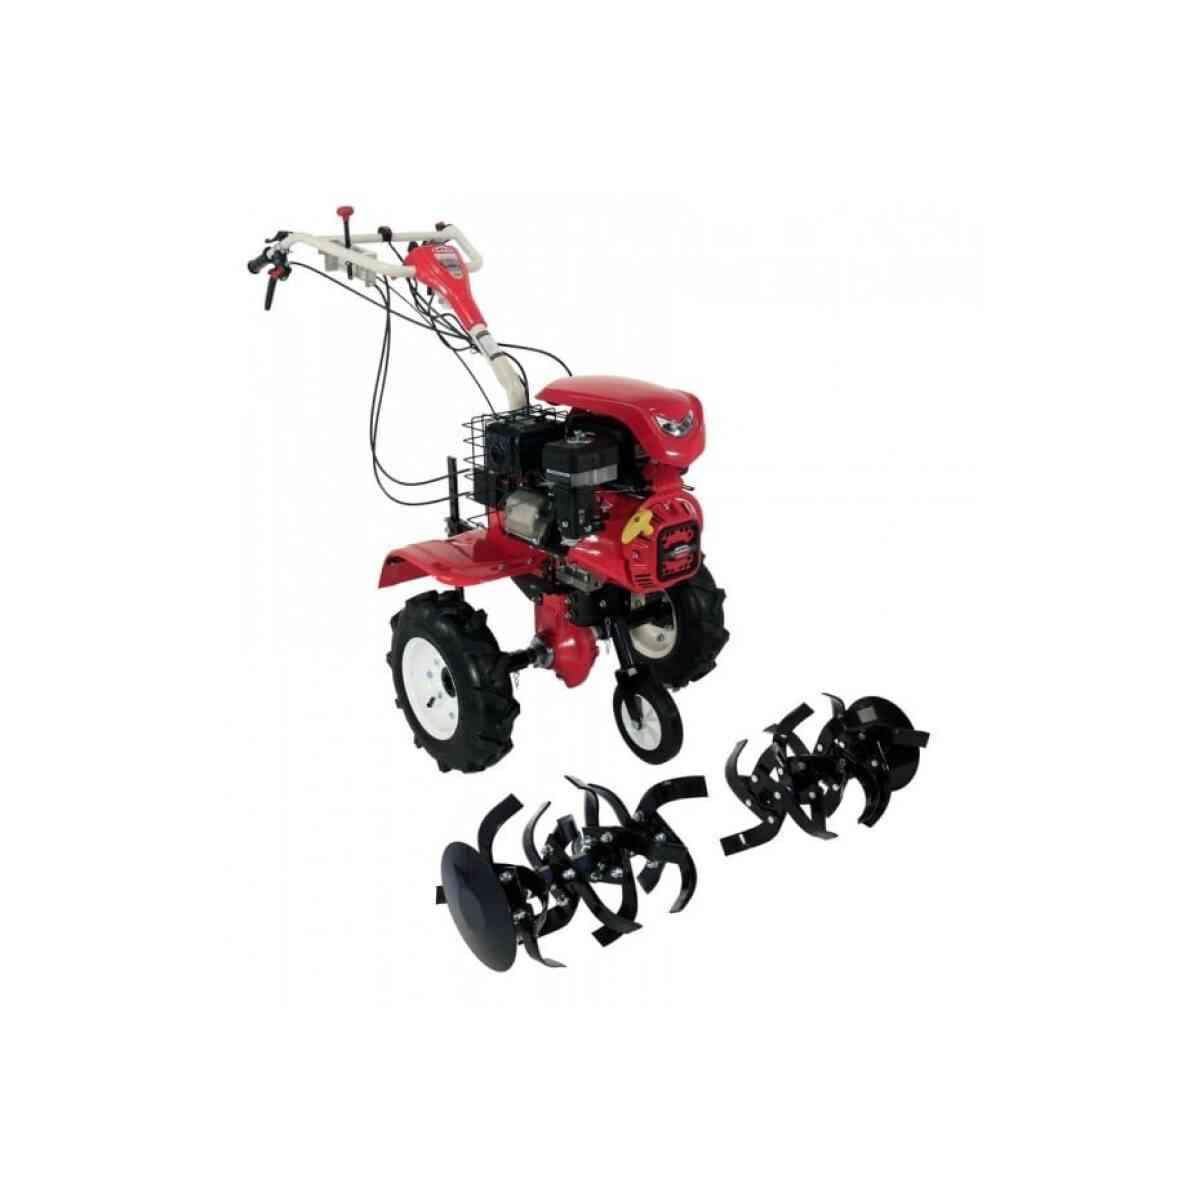 motocultor loncin lc1200 3plus1 o mac.ro 1 1 10